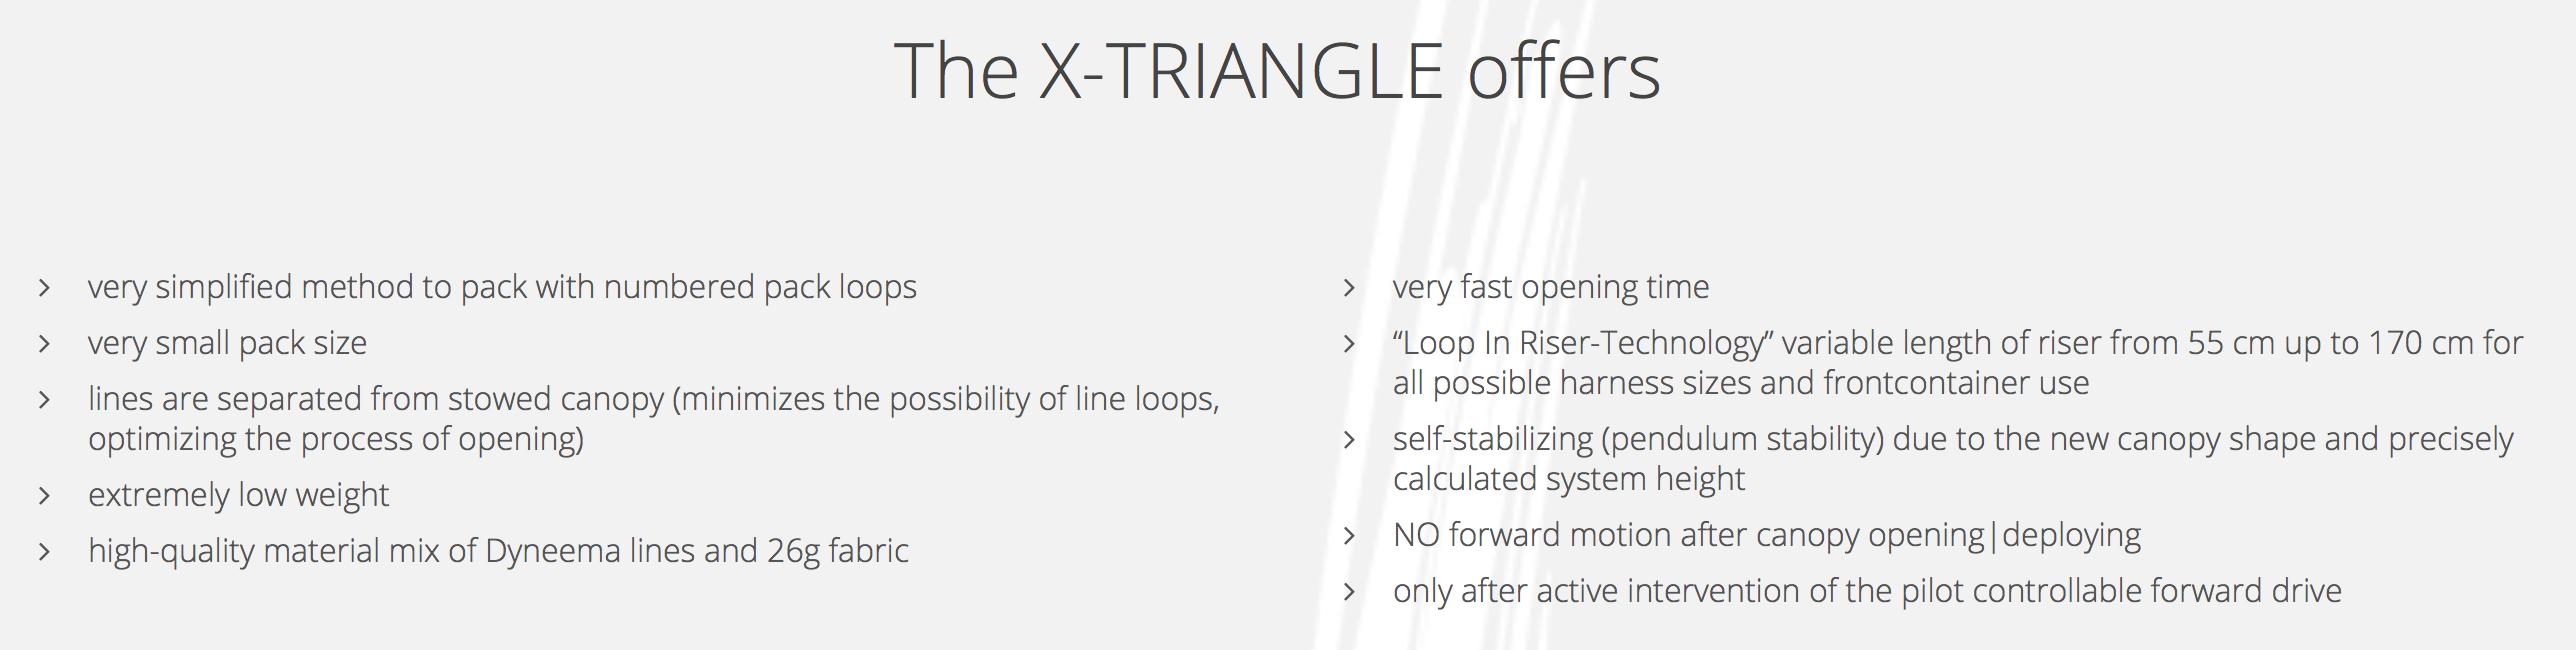 X-Dream X-Triangle - offers